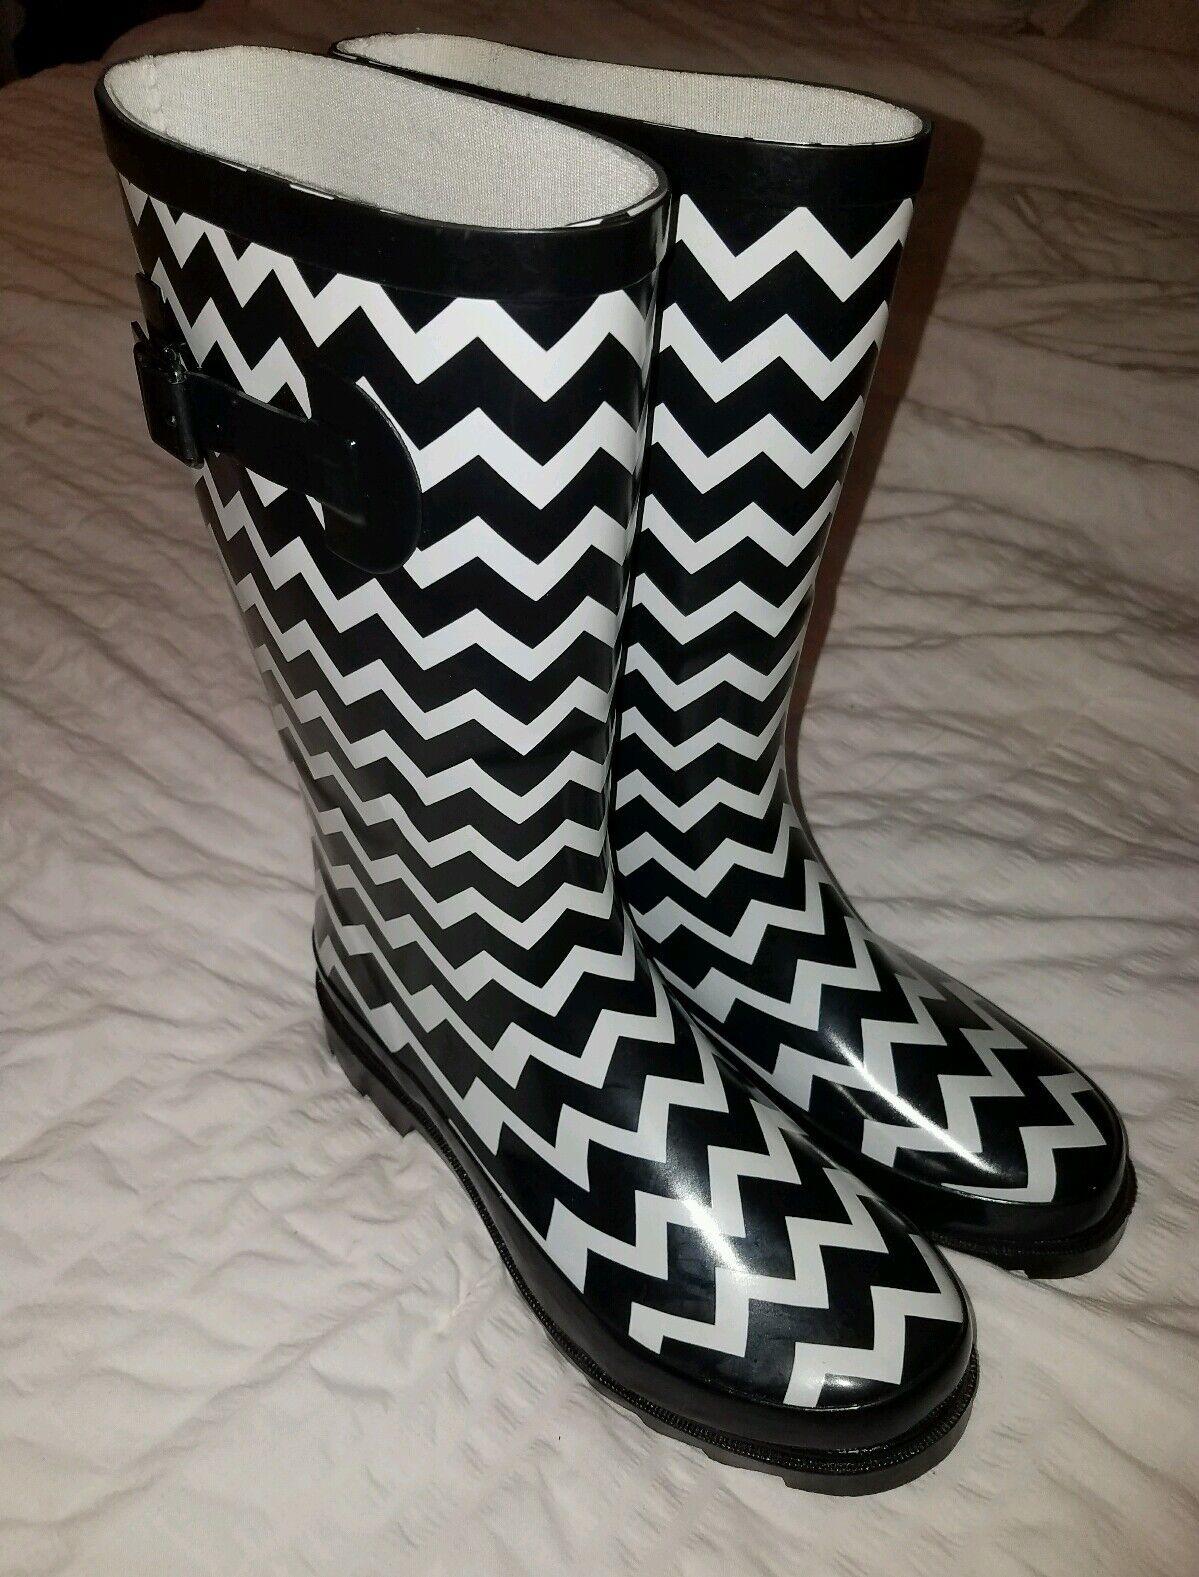 Flat Wellies\ Mid Calf Rubber Rain & Snow Boots Size Medium 7 /8